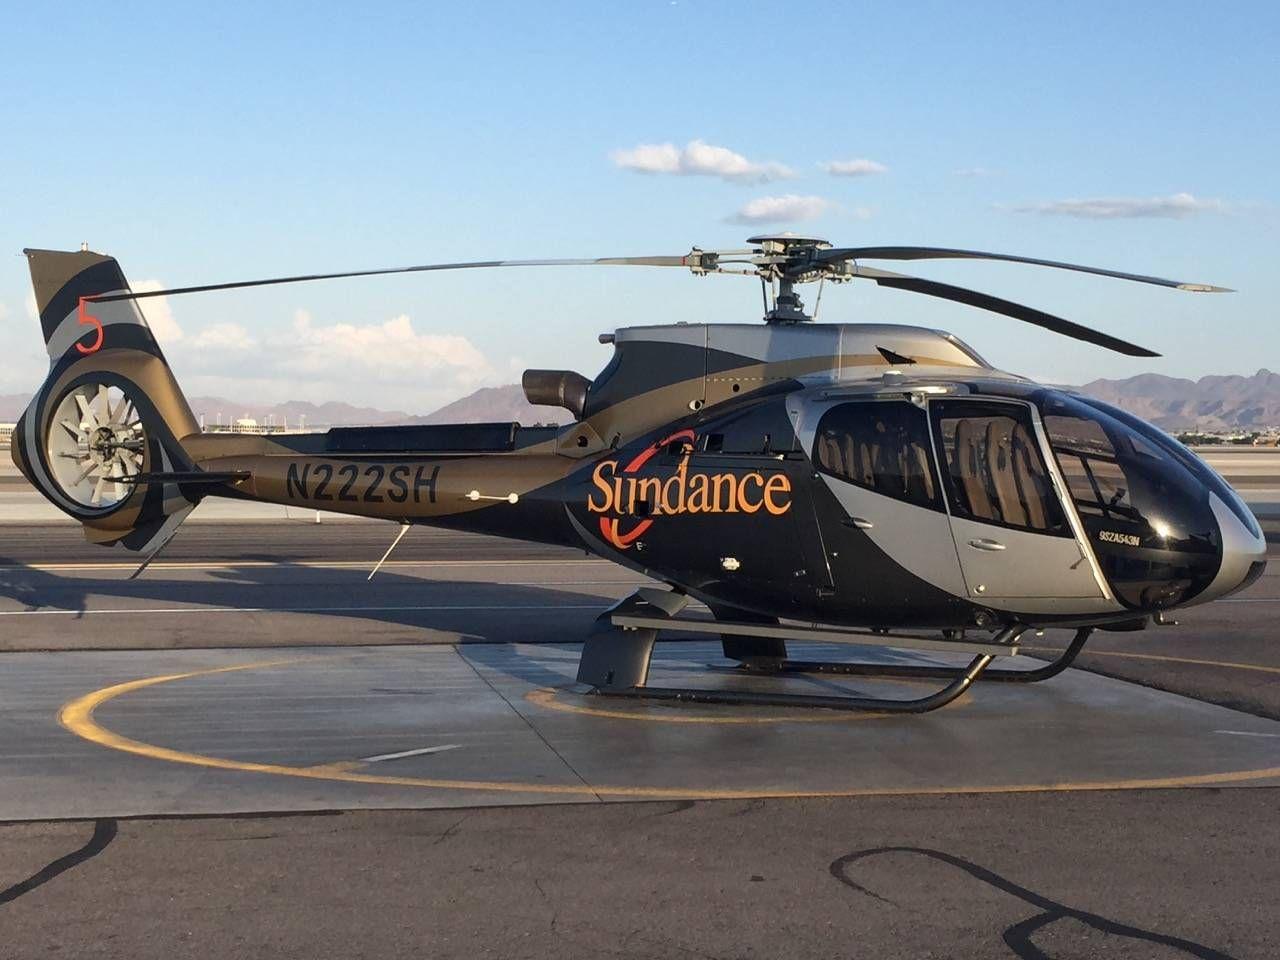 Sundance Helicopter Vegas-09